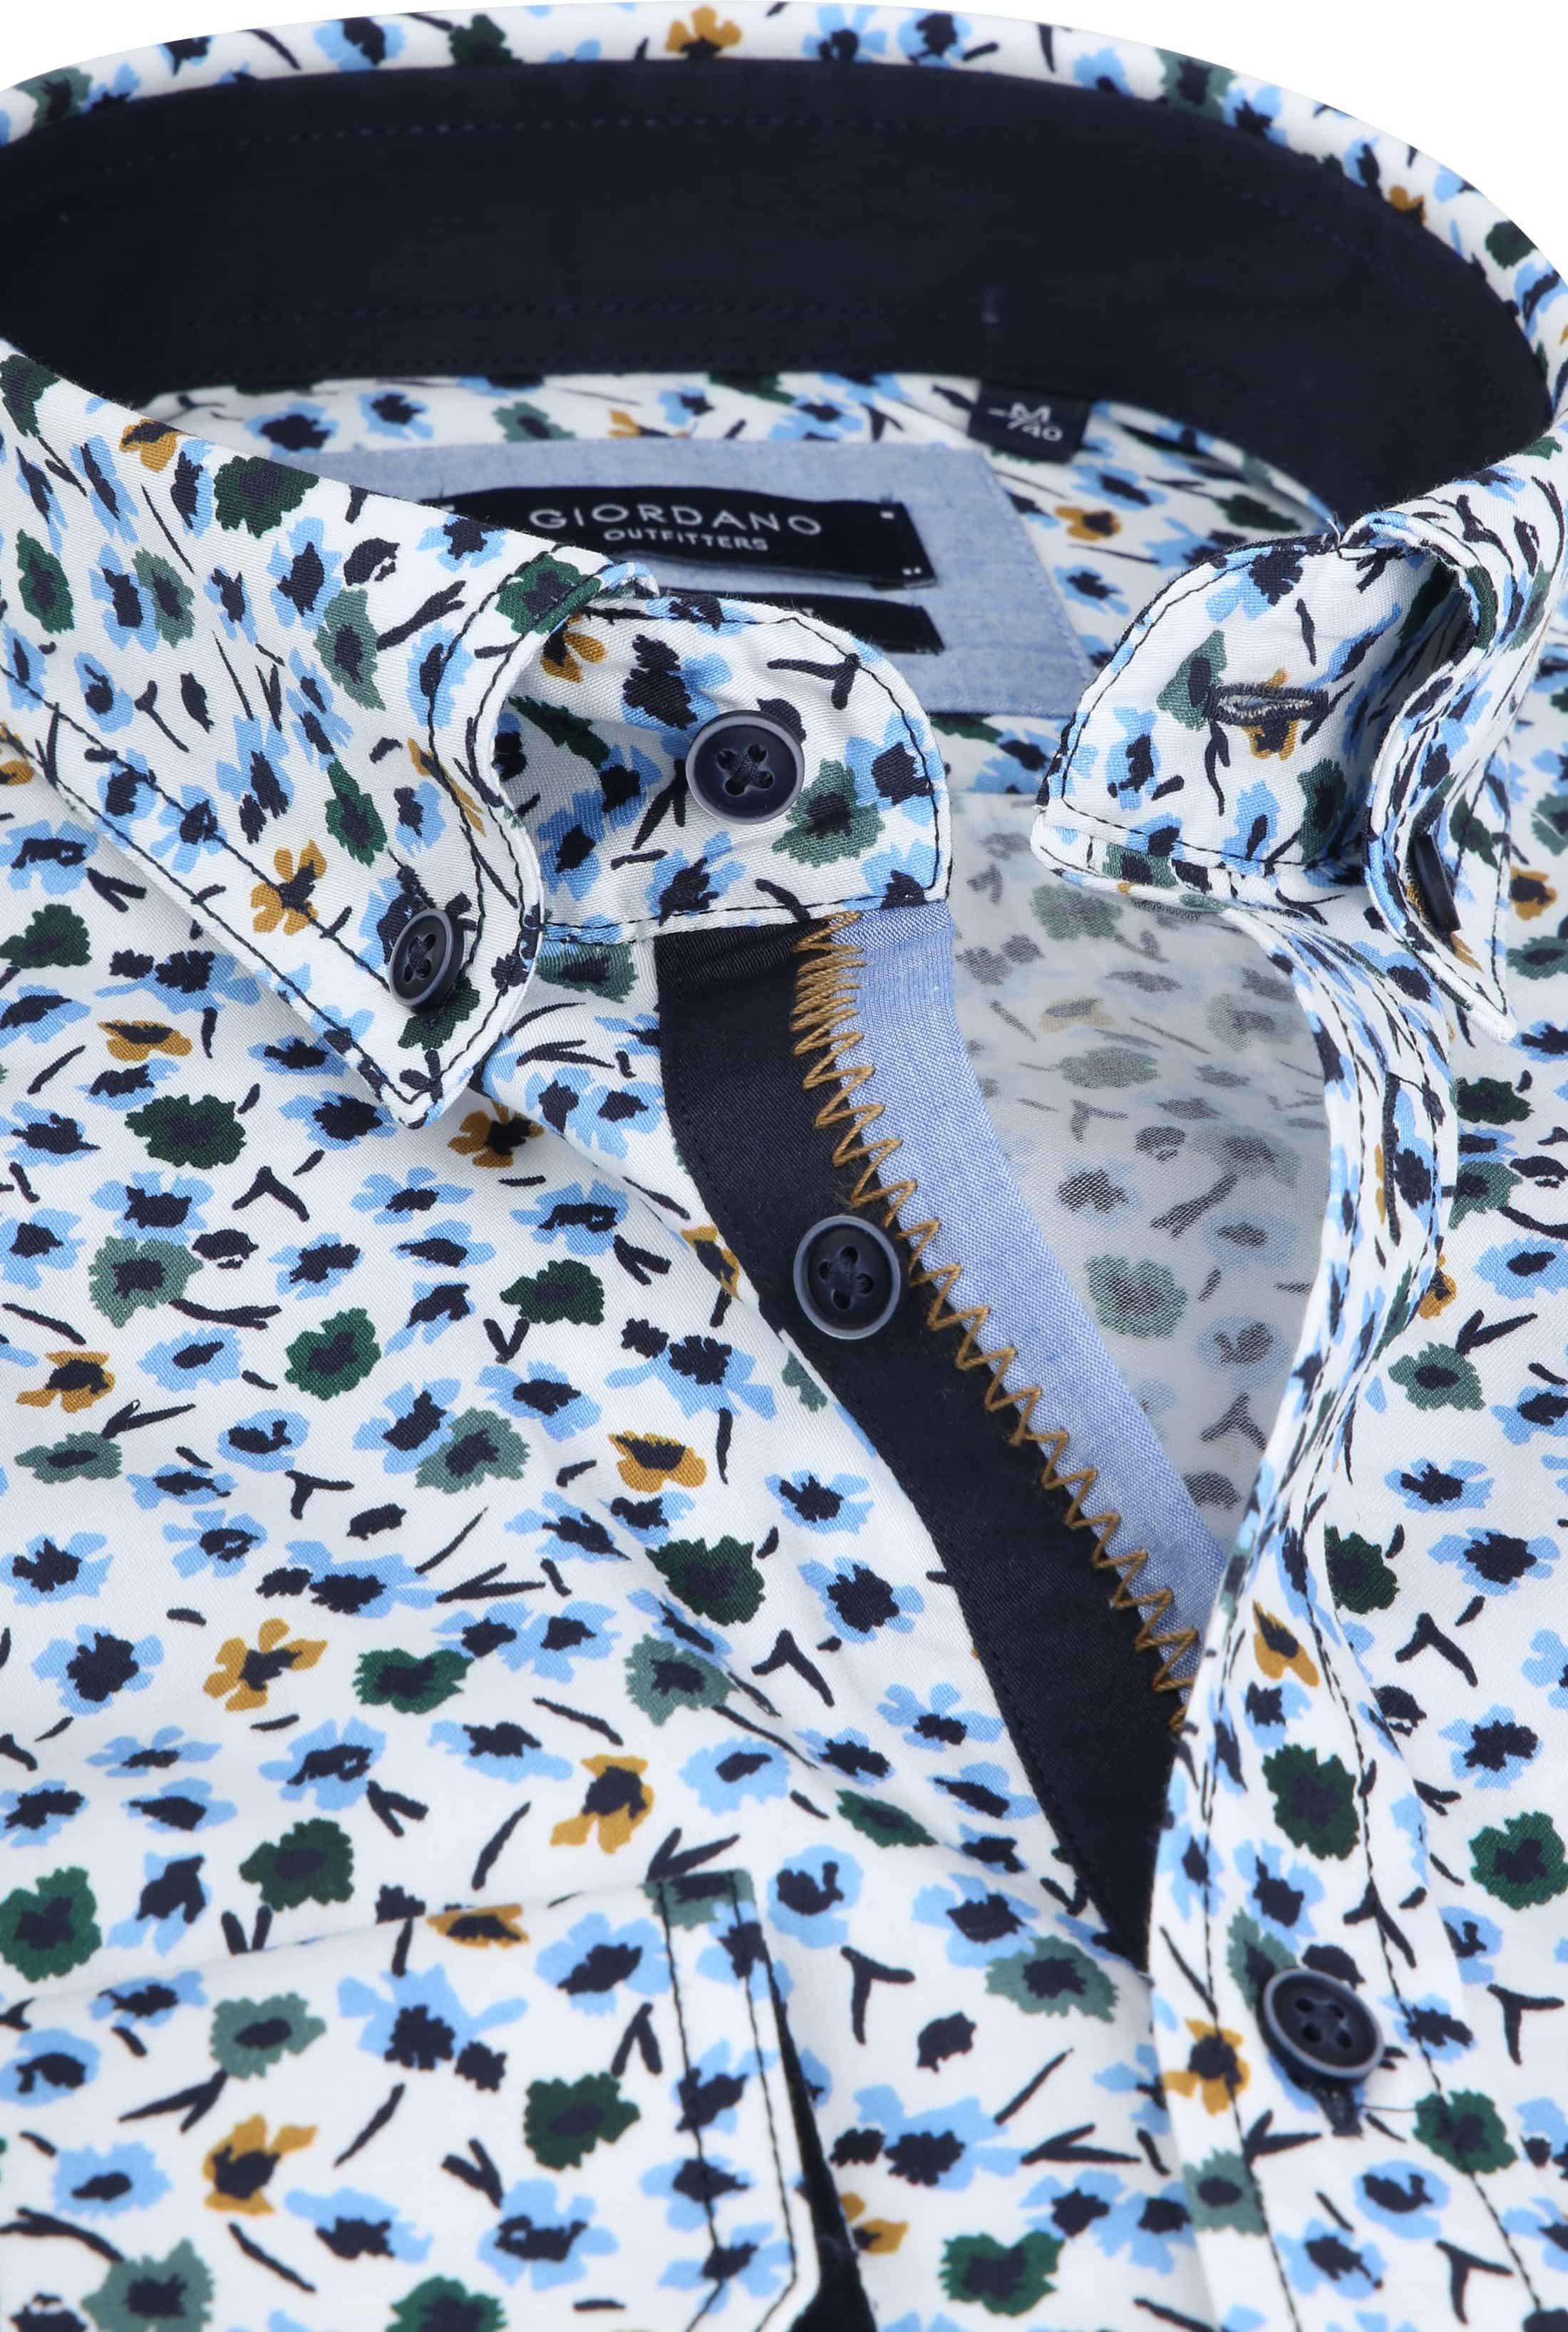 Giordano Walker Shirt Flower Blue foto 1